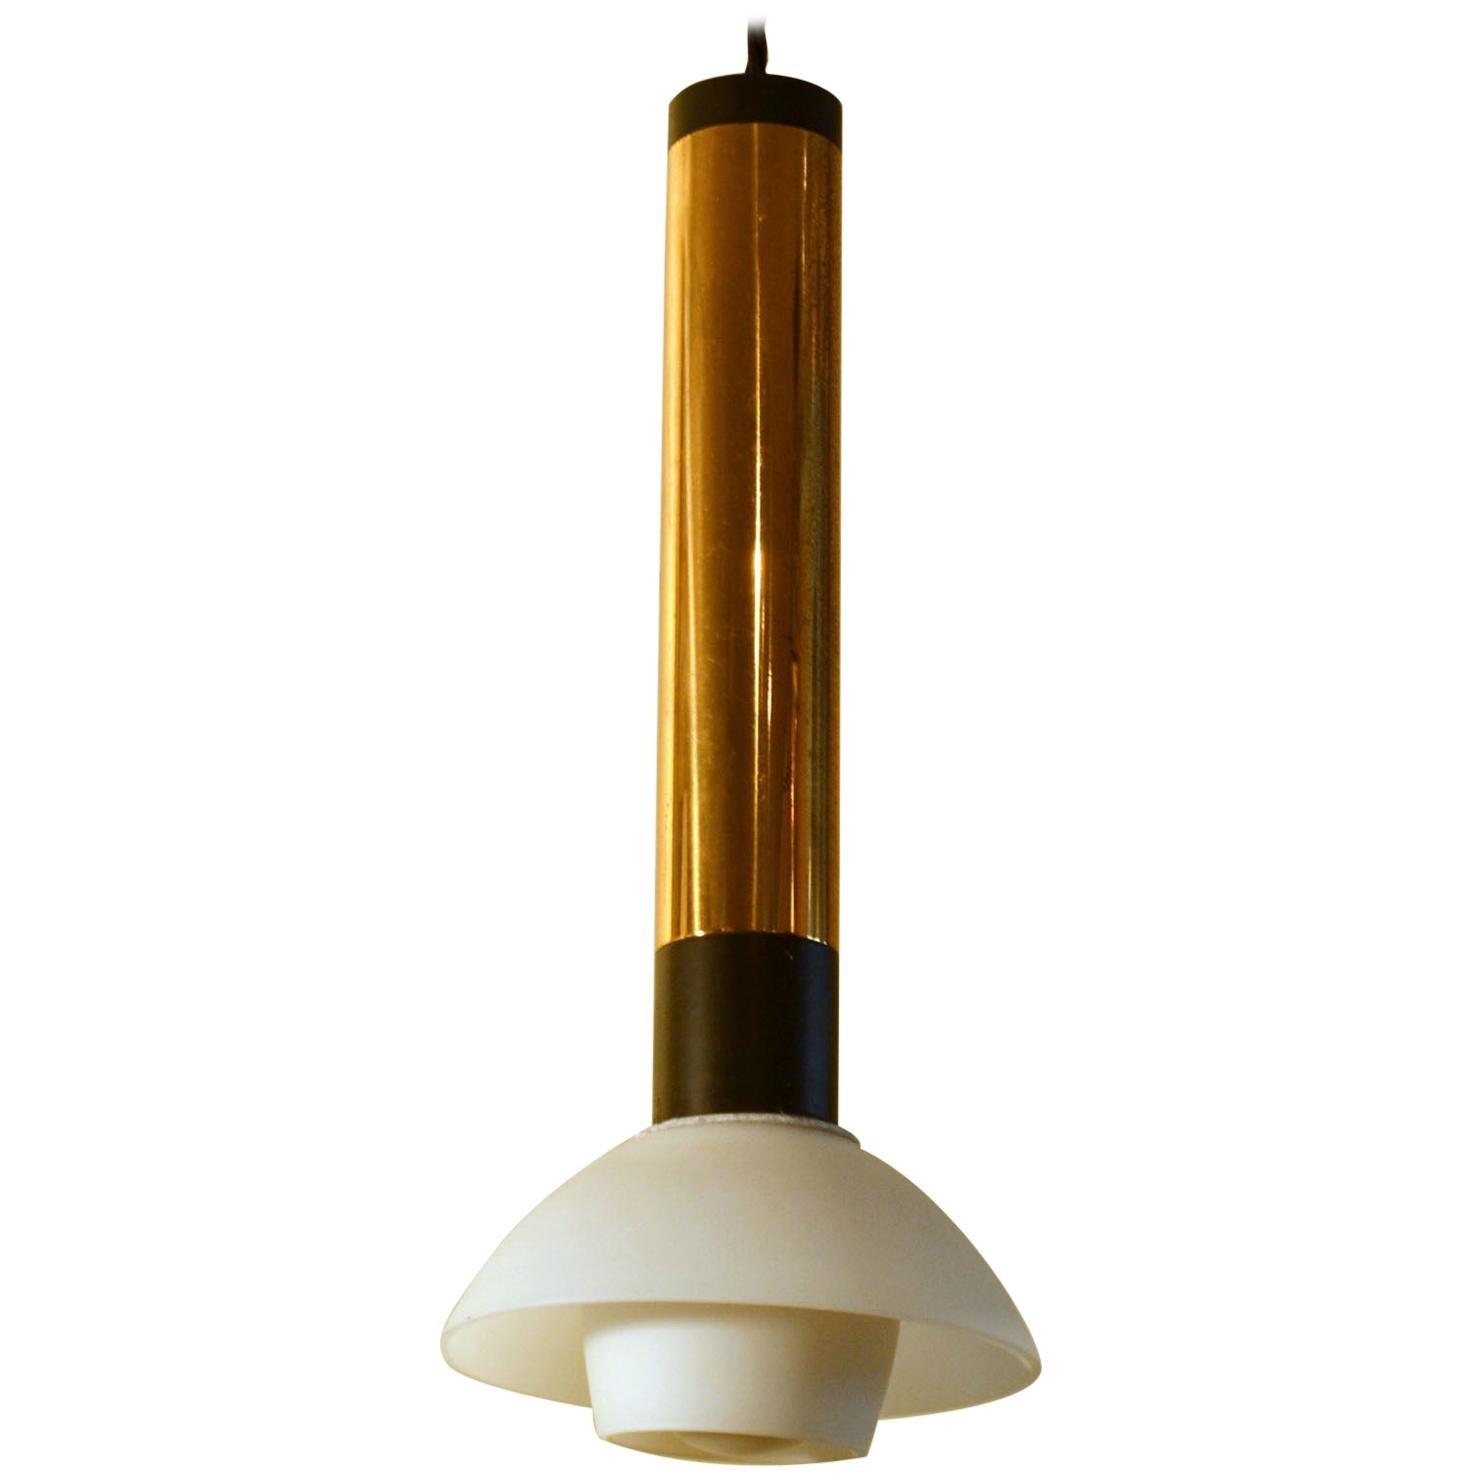 Stilnovo 1950s Italian Pendant Lamp with Opaline Glass Diffuser